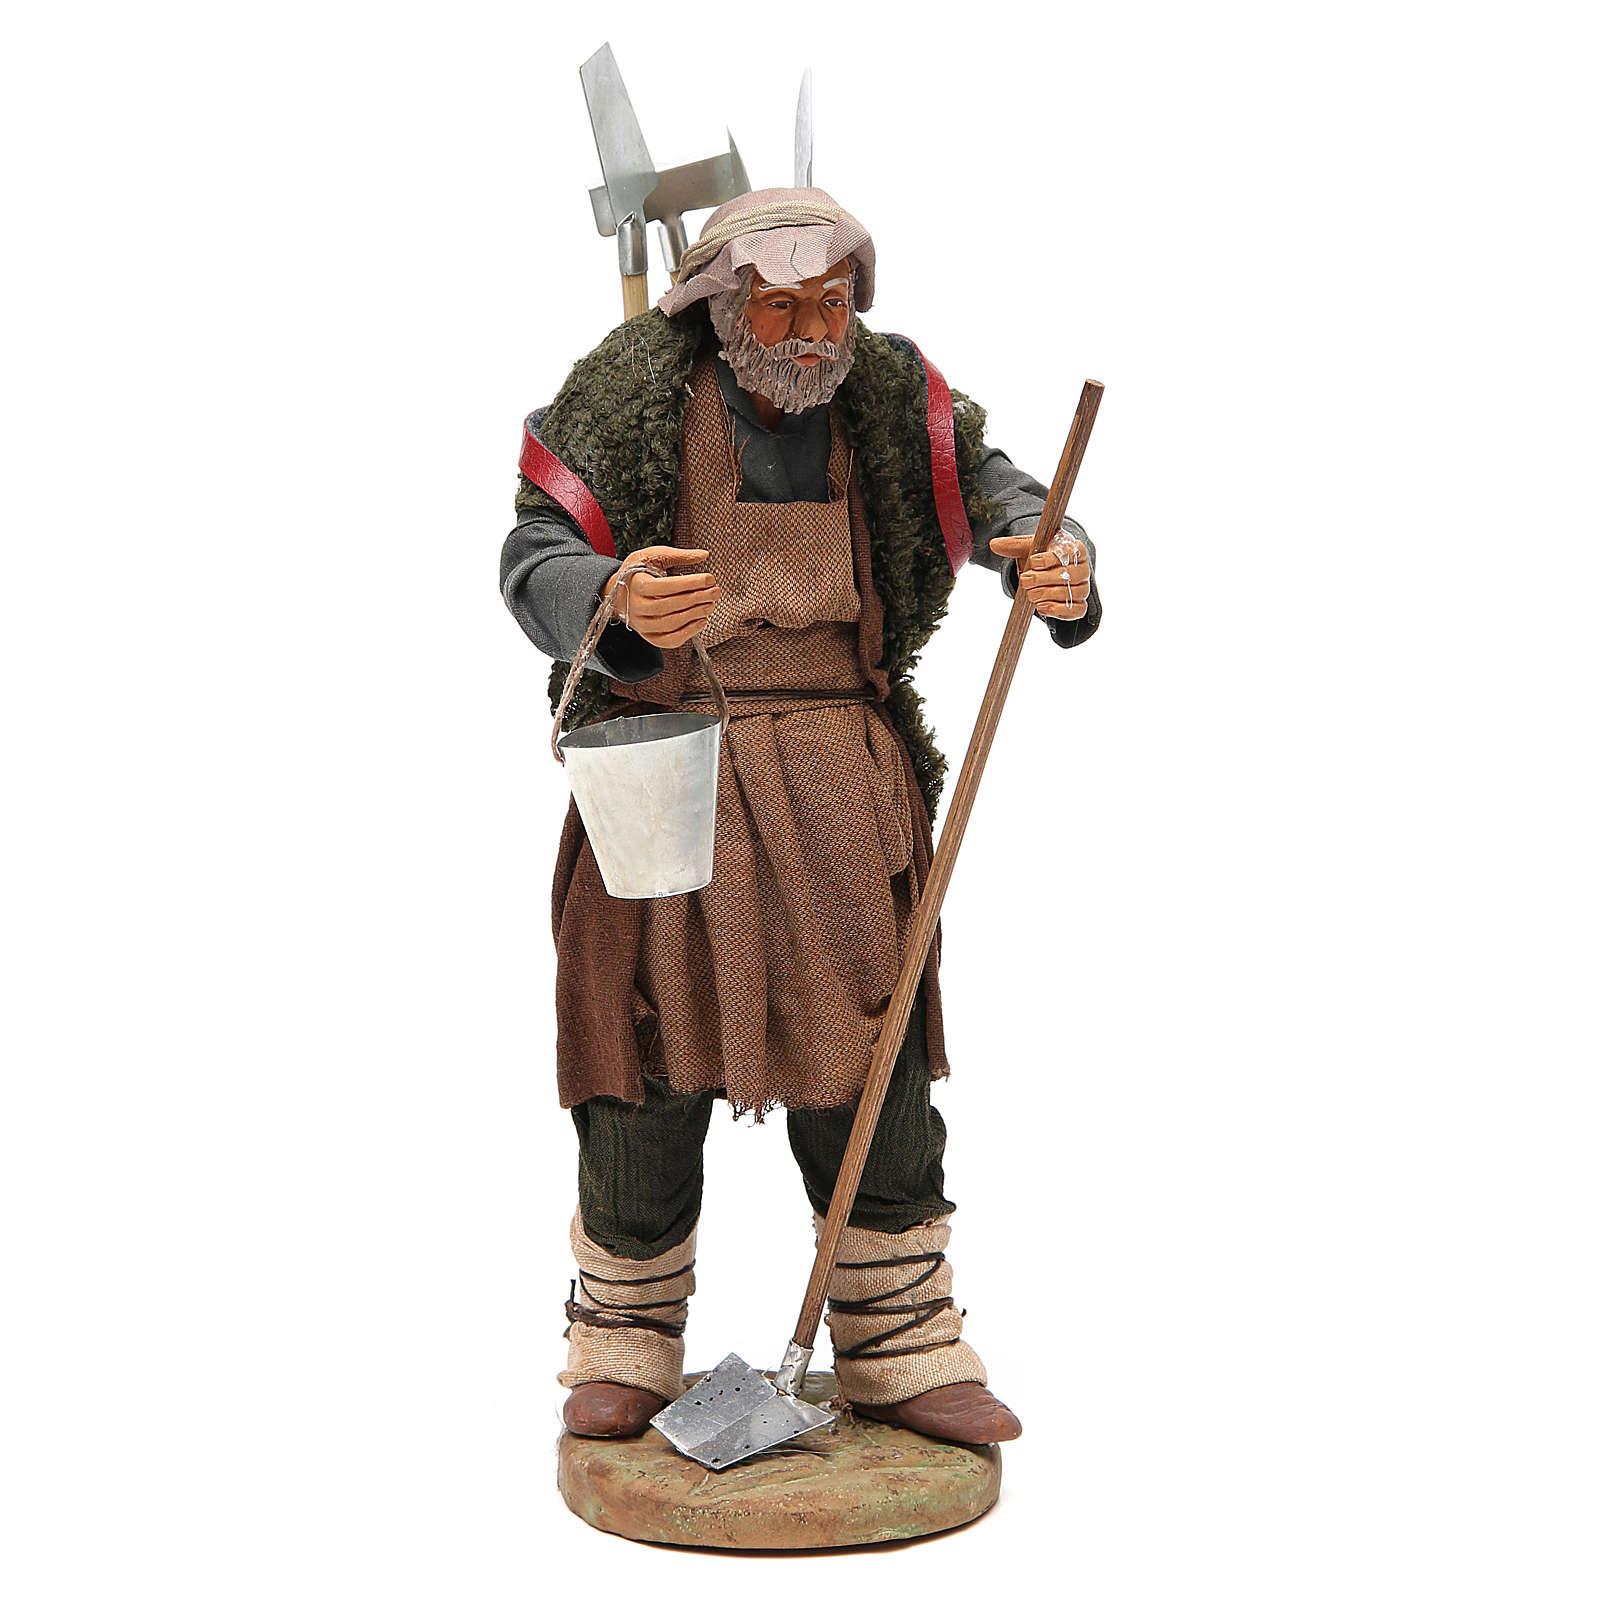 Man with farming tools, Neapolitan nativity figurine 24cm 4